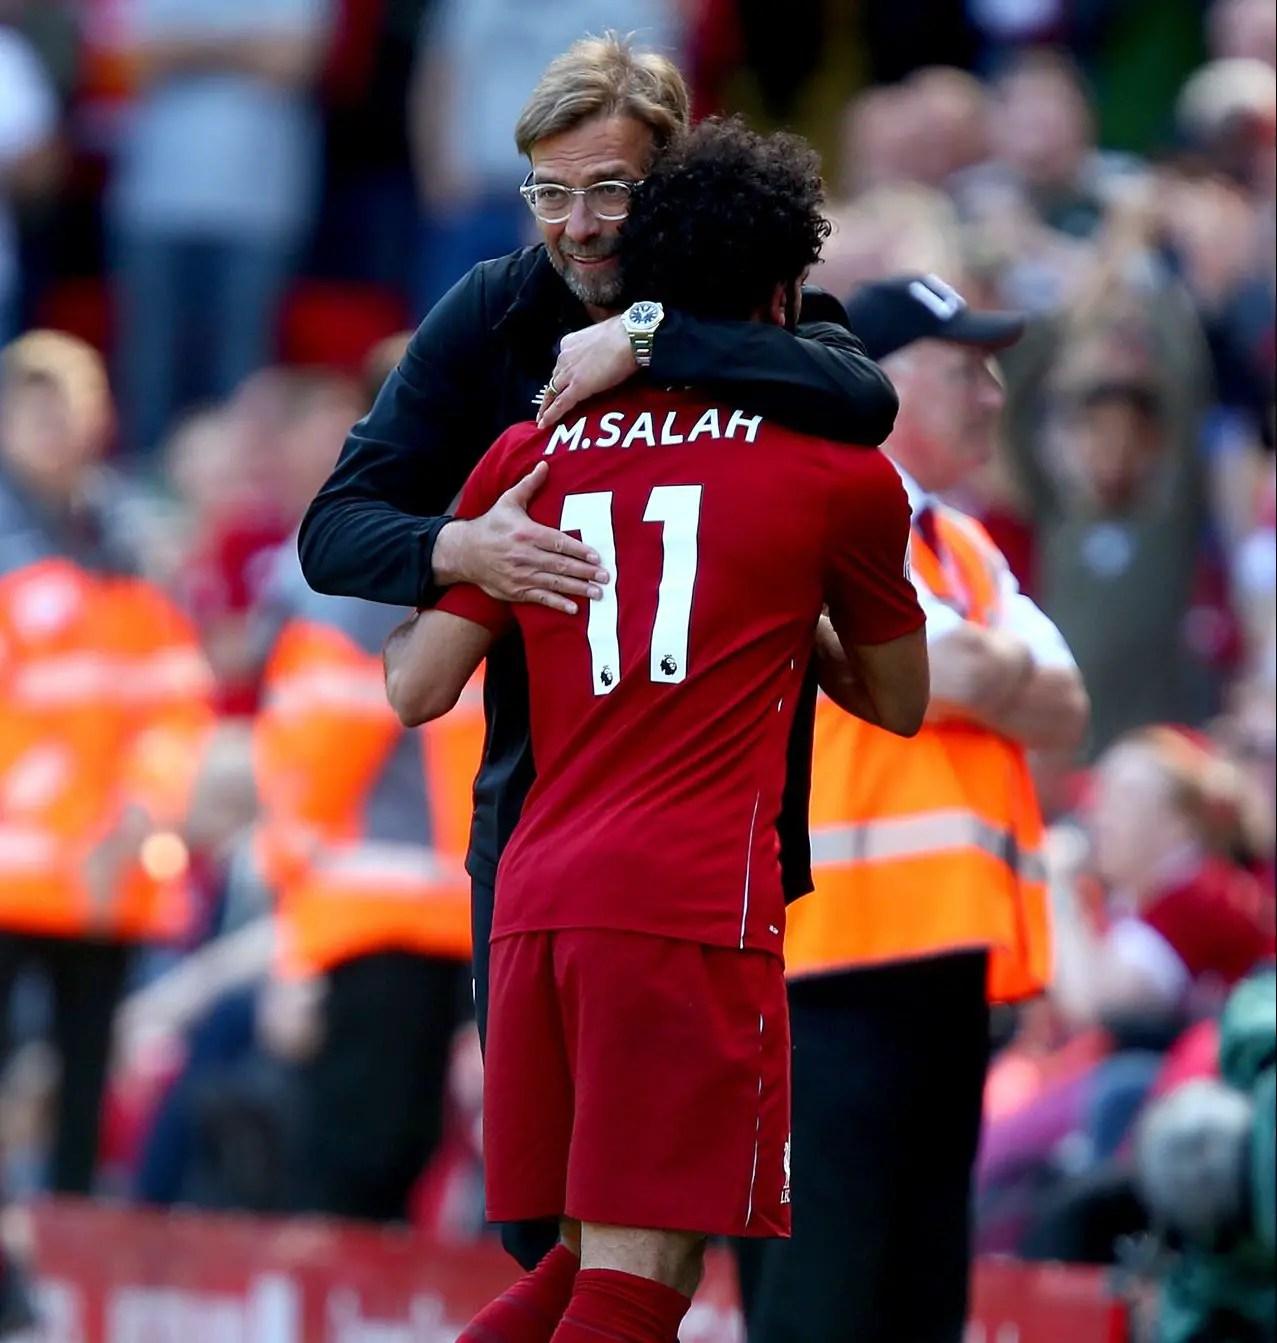 Salah Refreshed After Break – Klopp